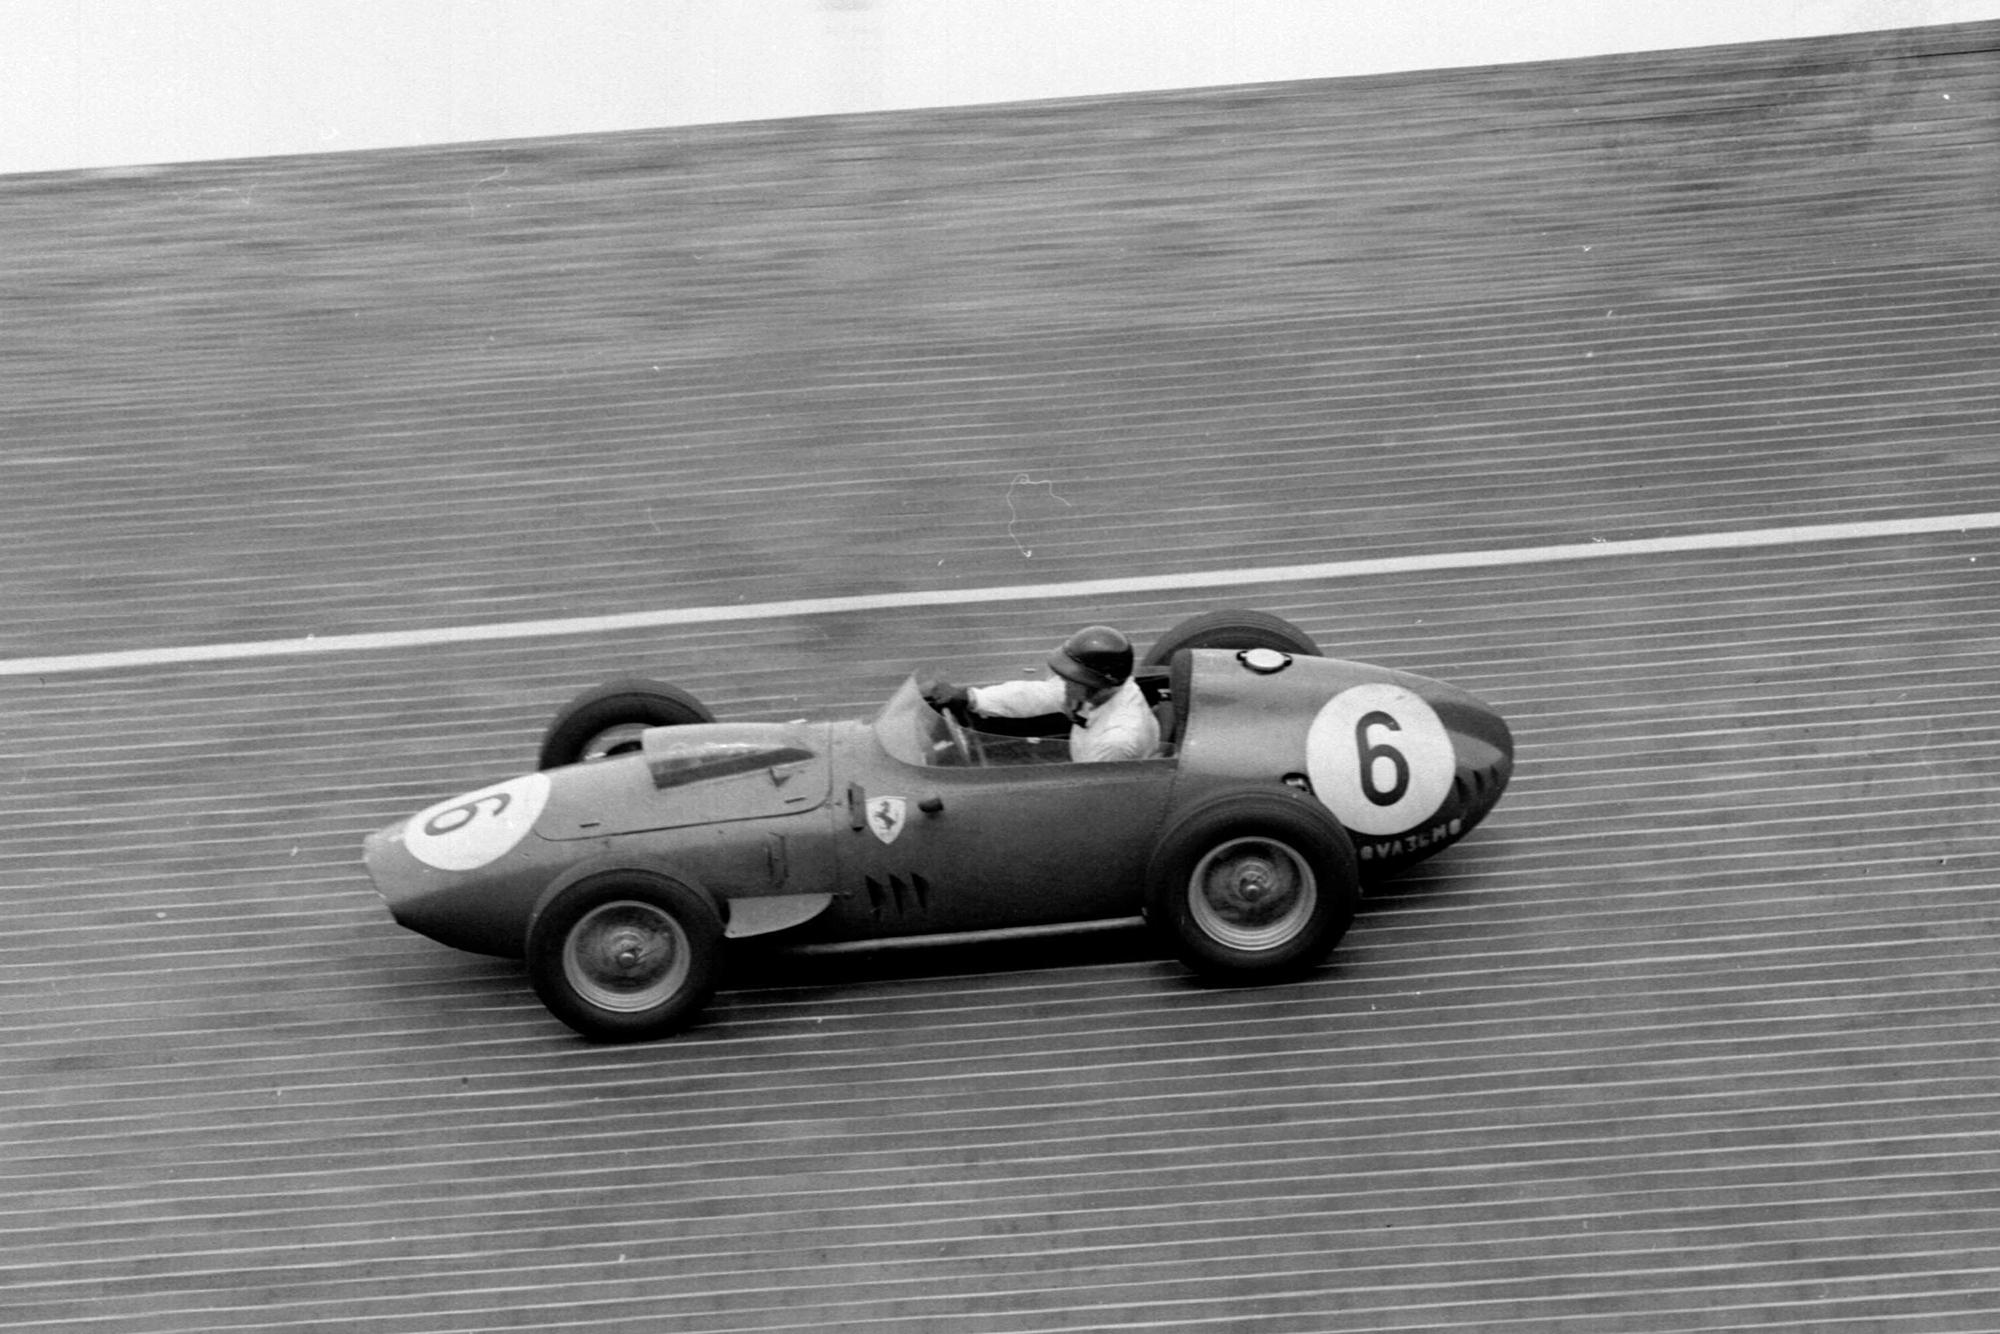 Dan Gurney takes his Ferrari Dino 246 around the banked North Turn.